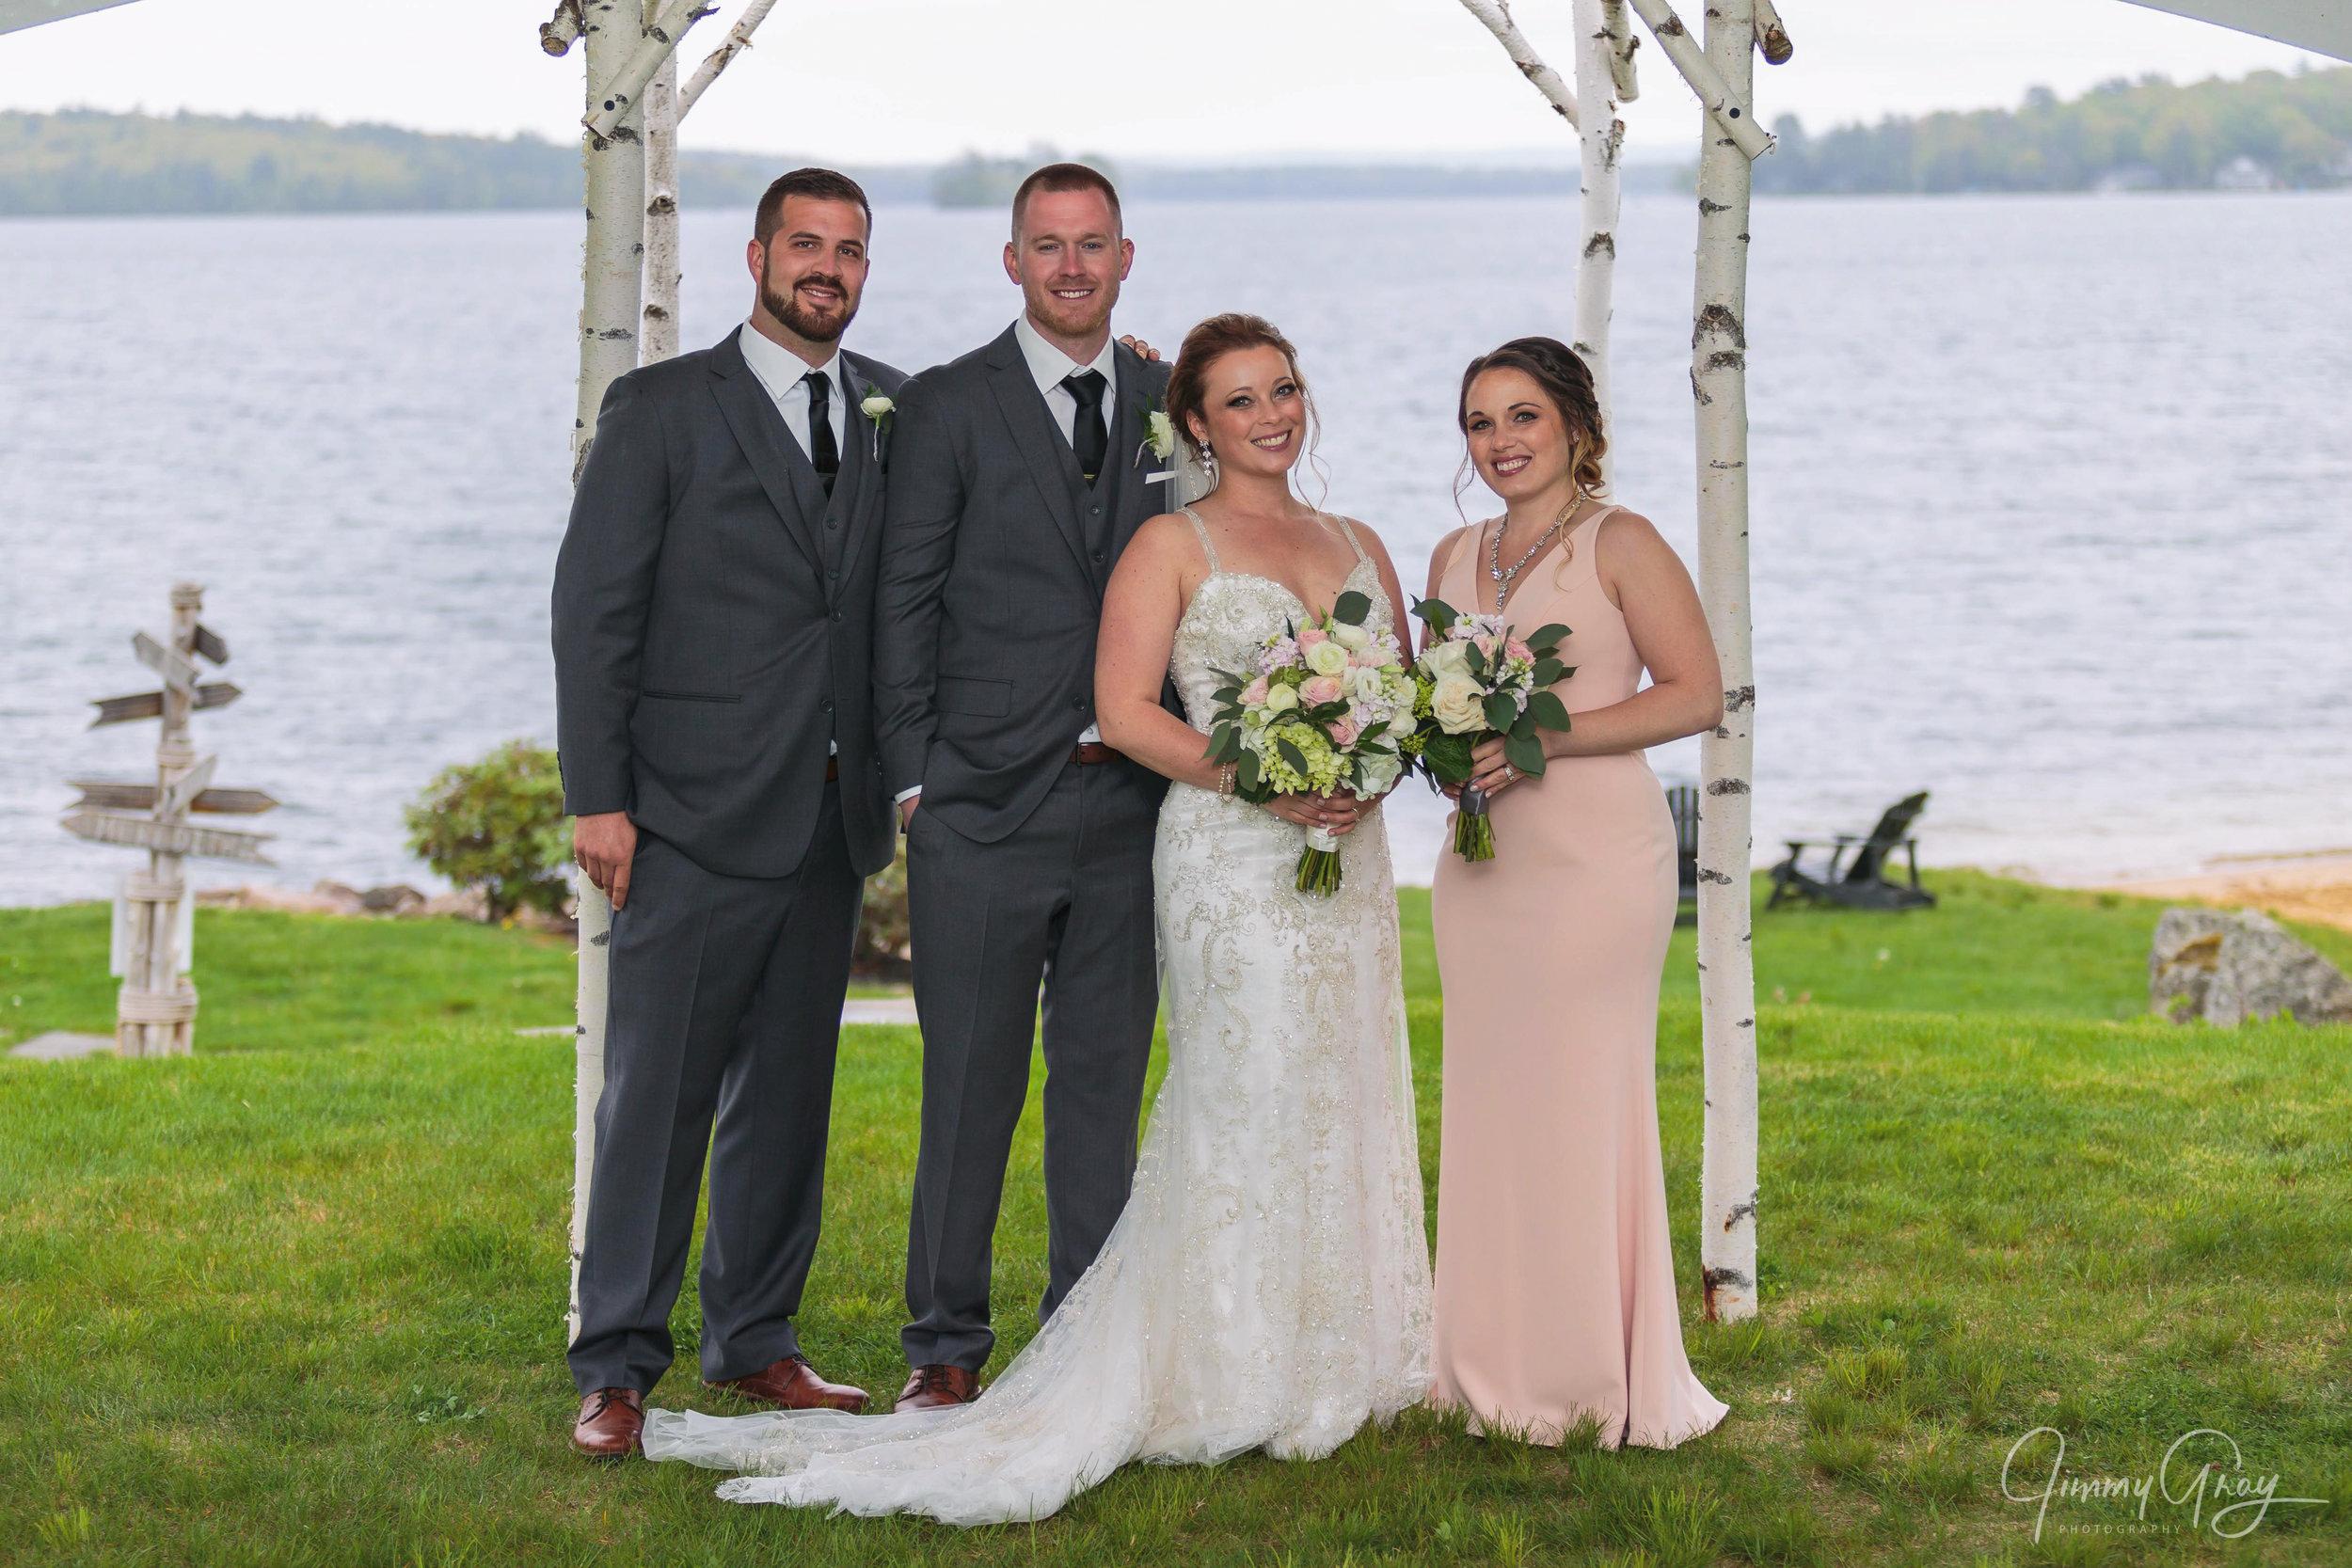 NH Wedding Photography - Jimmy Gray Photo - Laconia, NH - Akwa Marina Yacht Club